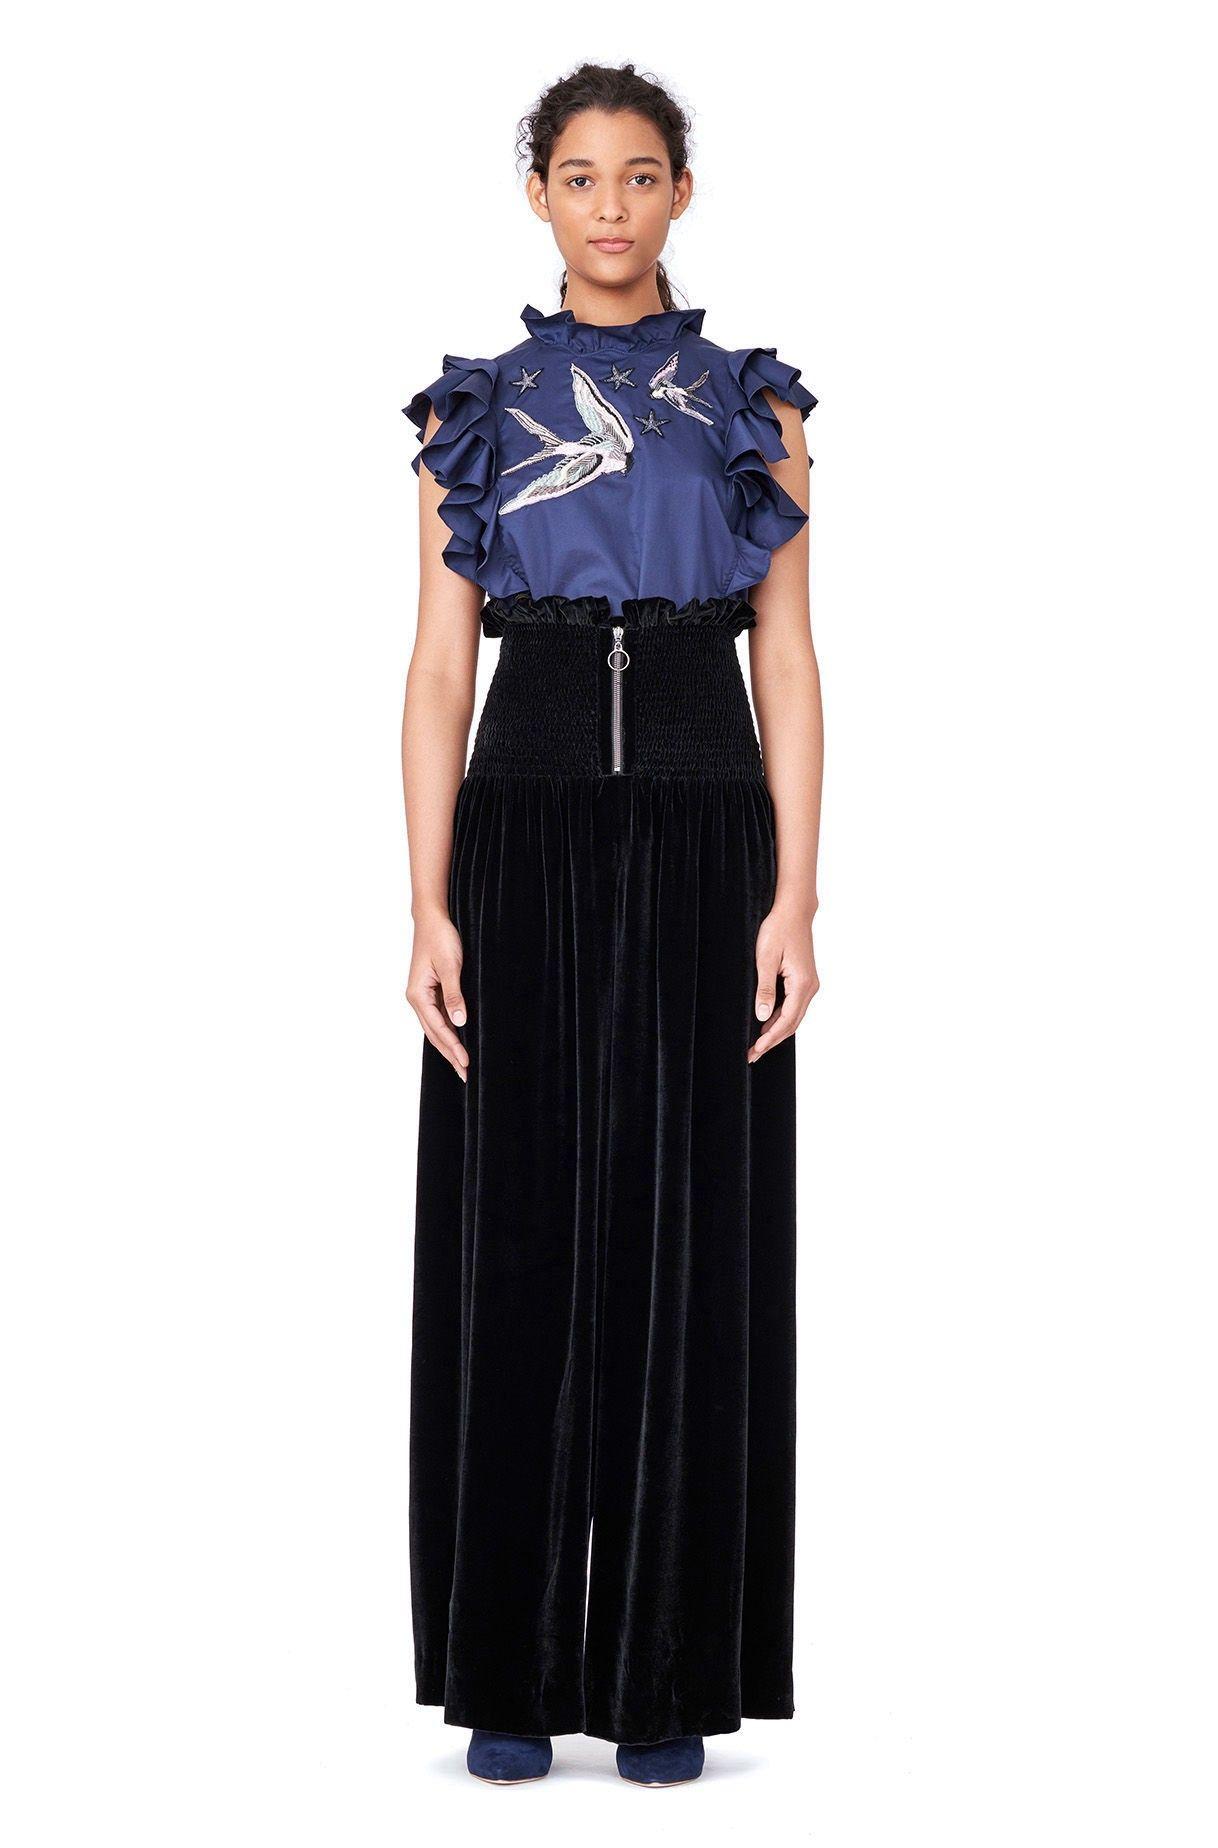 8740a8102fa REBECCA TAYLOR Smocked Velvet Wide Leg Pant - Black.  rebeccataylor  cloth